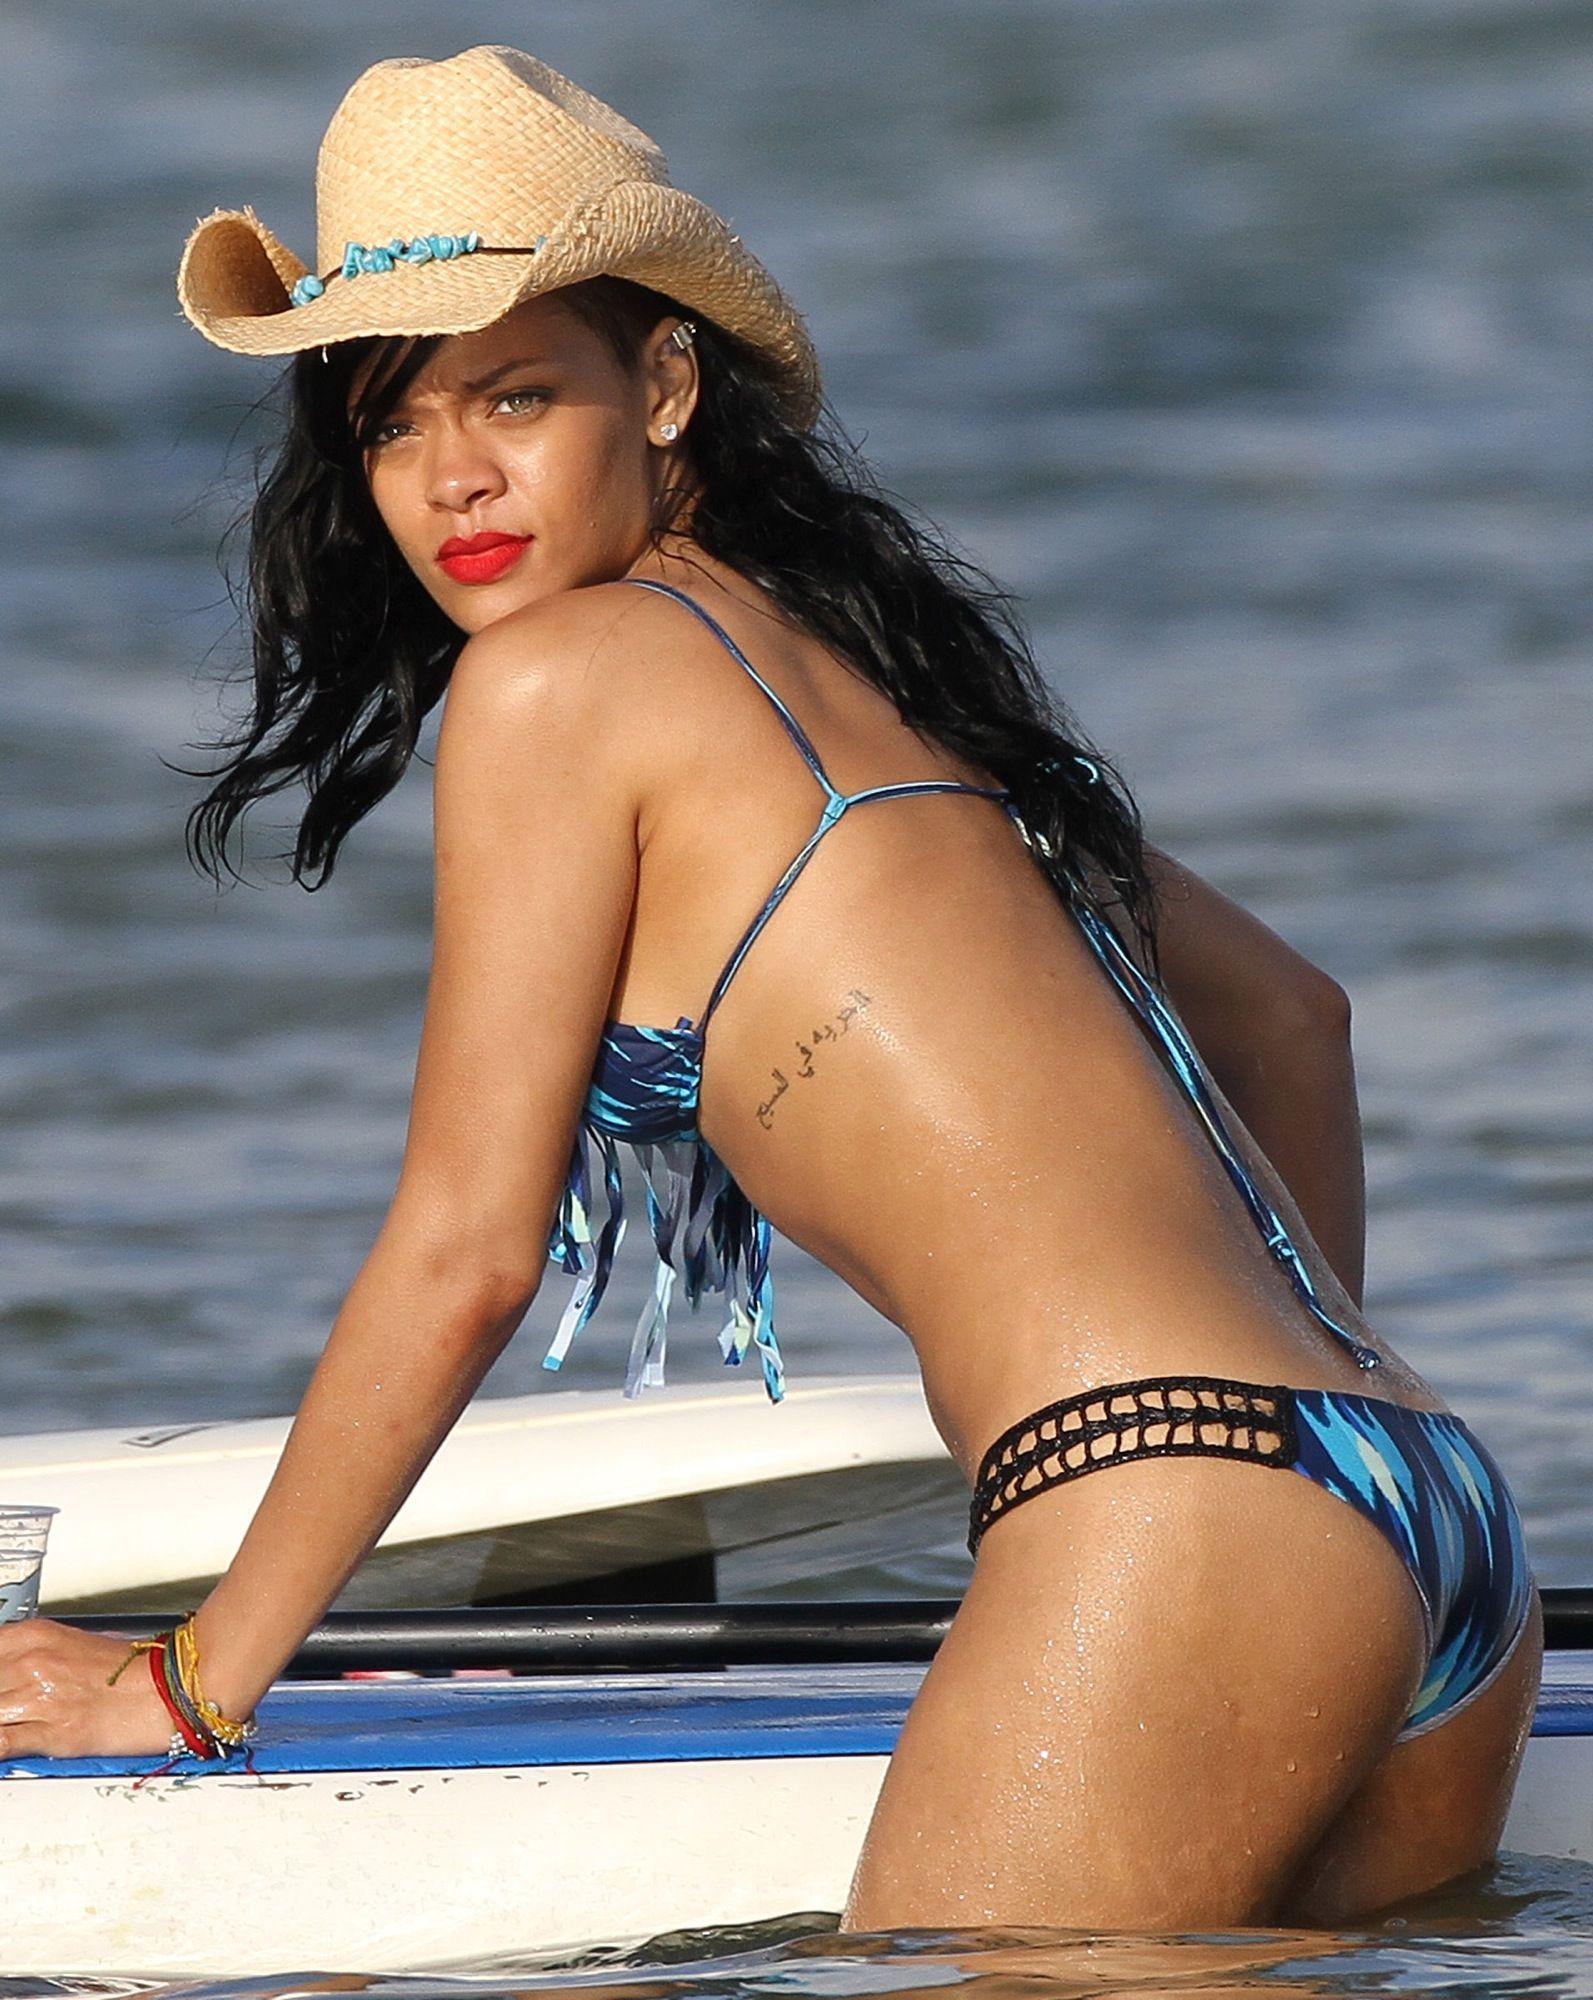 Rihanna Rihanna Rihanna Rihanna Rihanna Rihanna Rihanna Rihanna Rihanna vfb76gyY